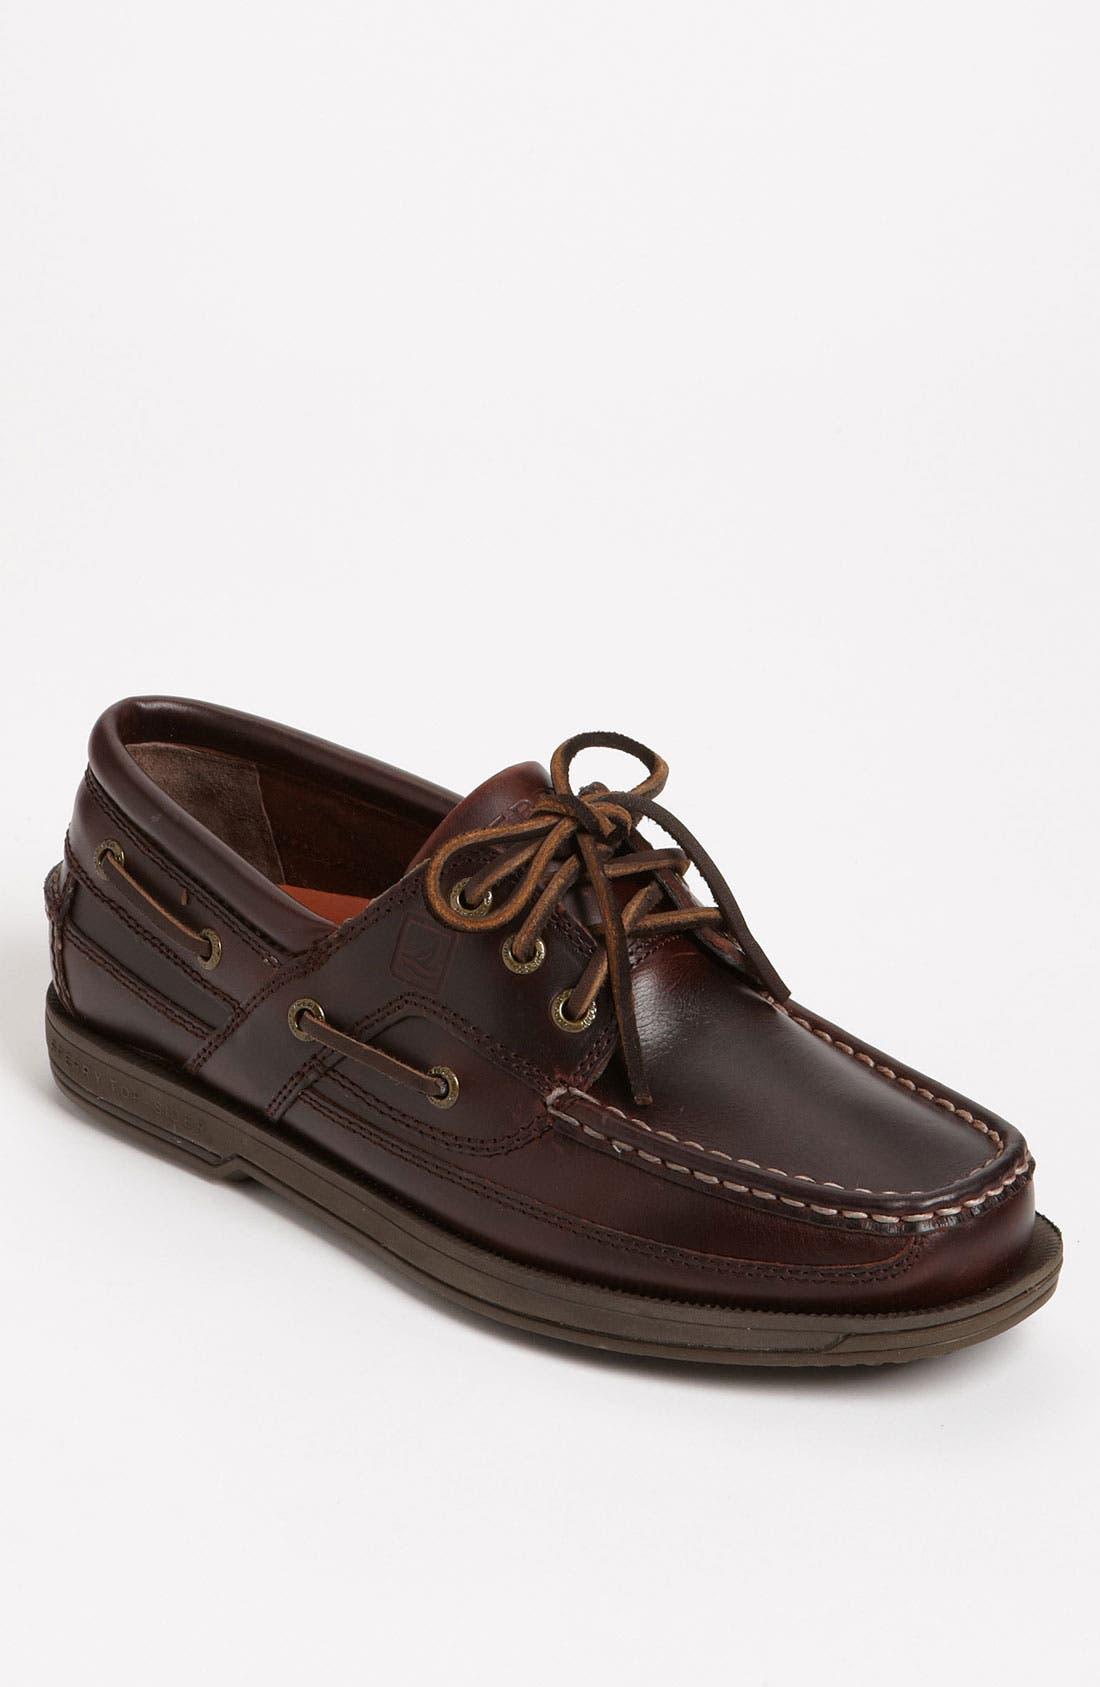 Main Image - Sperry Top-Sider® 'Mariner II' Boat Shoe